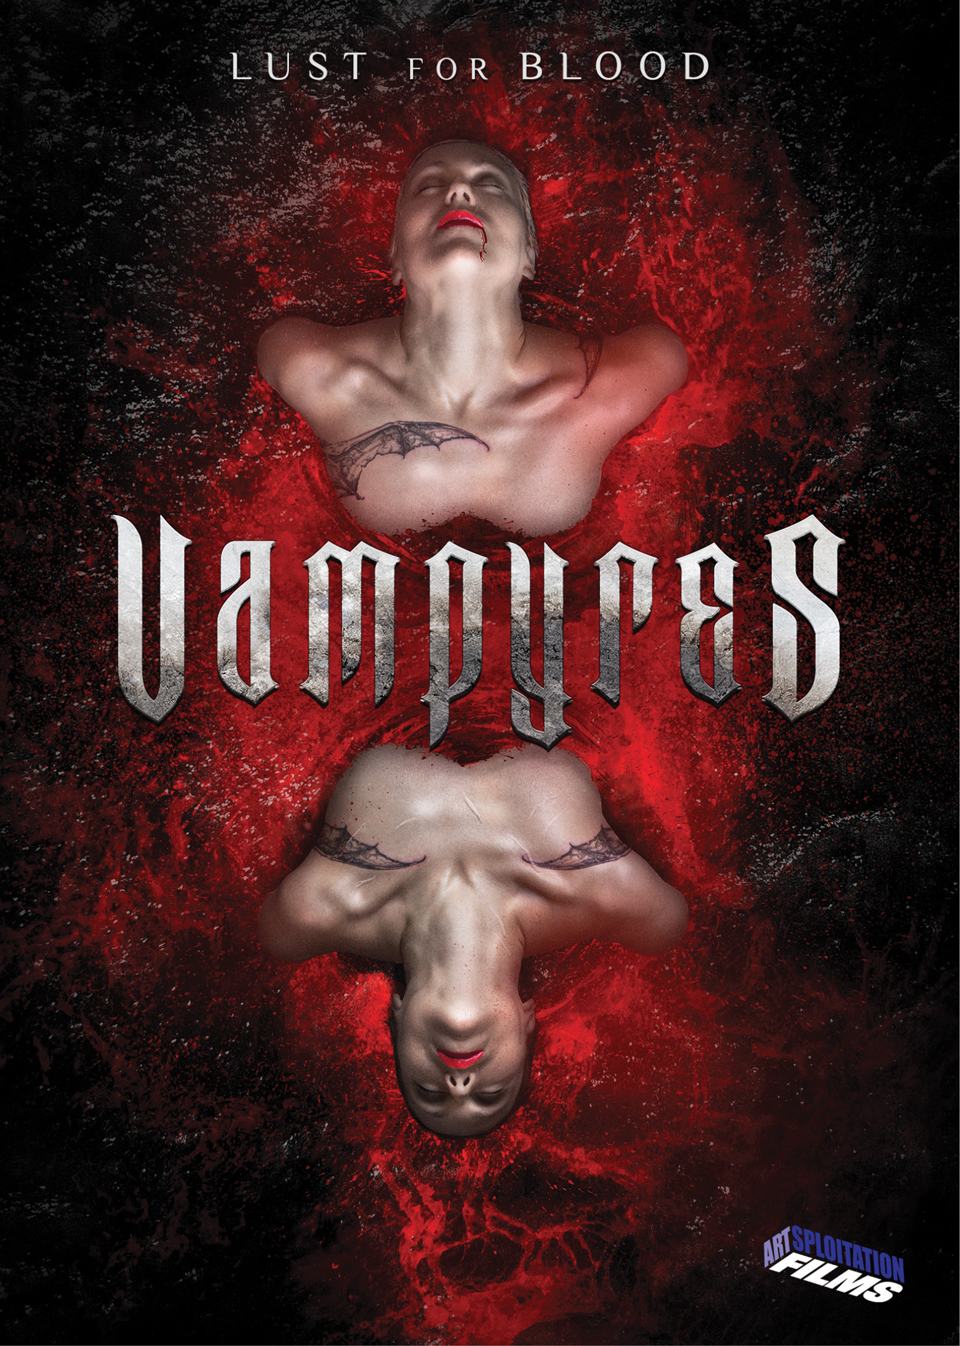 Vampyres Movie Review